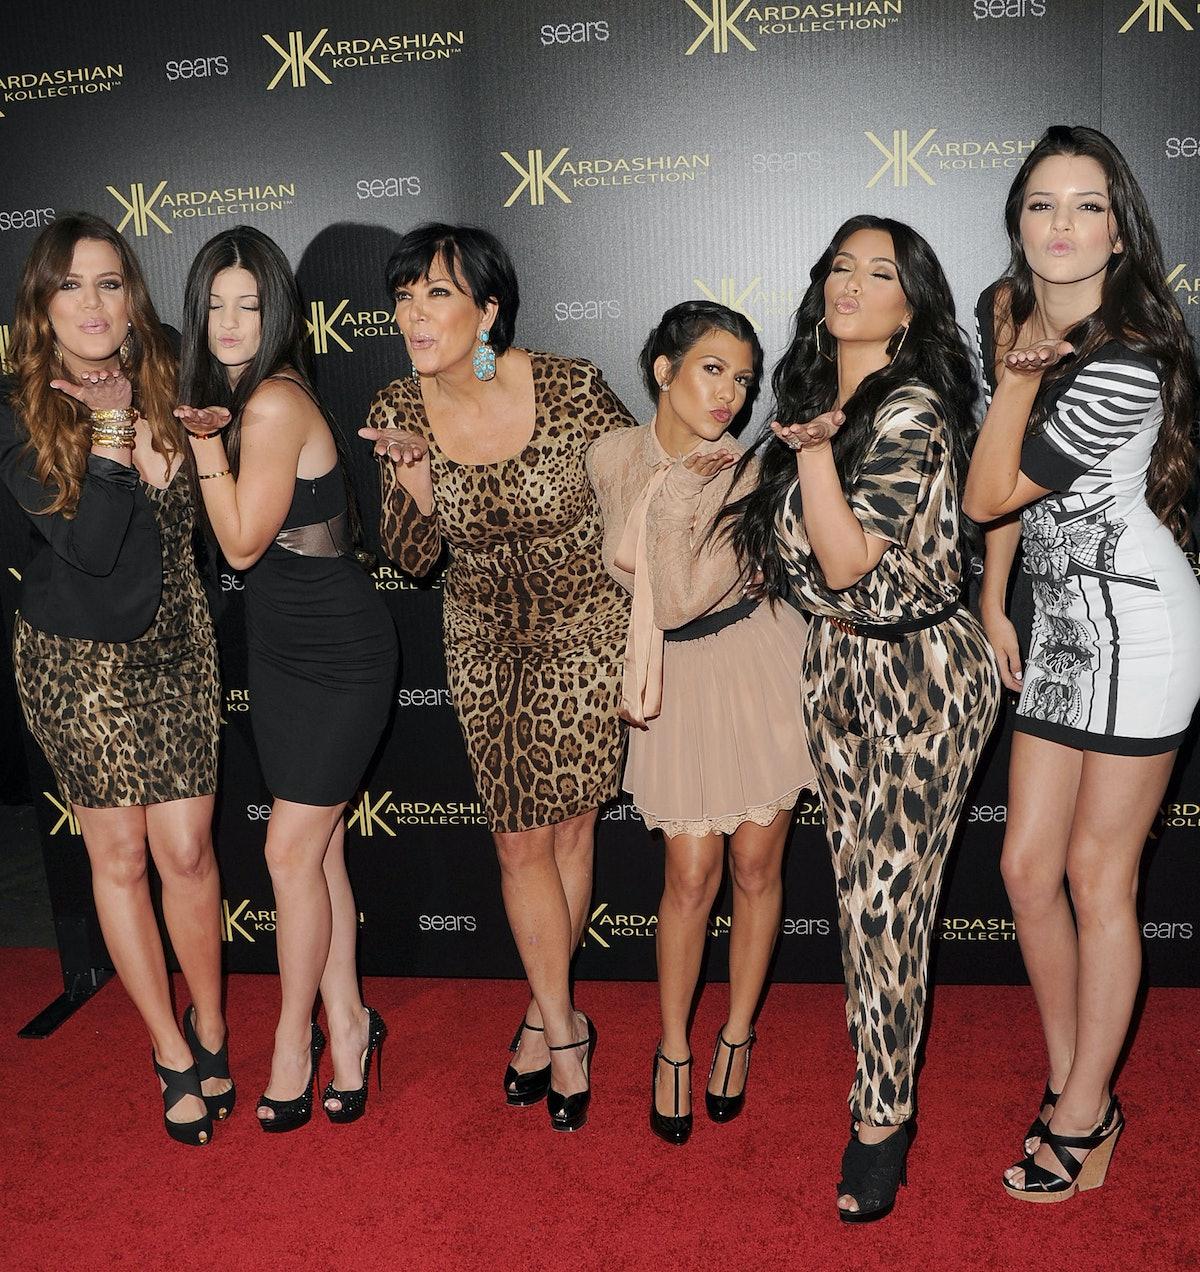 The Kardashians blowing kisses